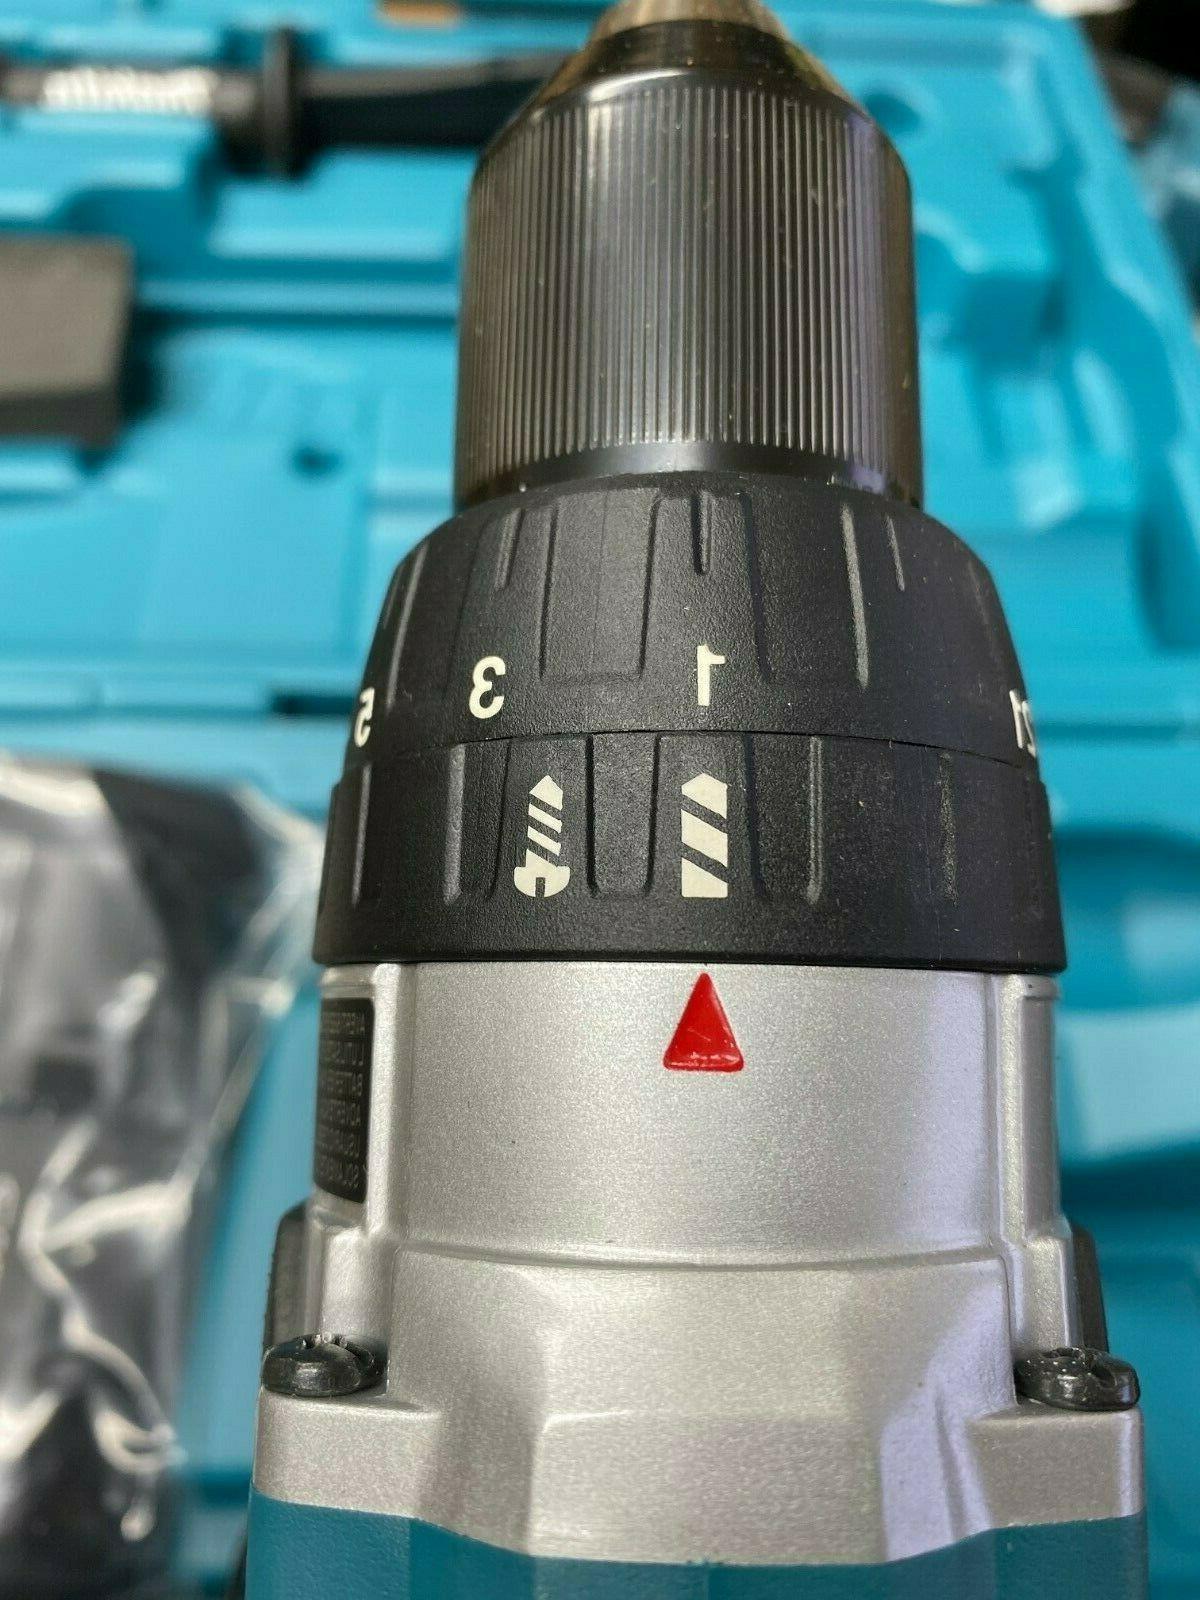 Makita 18-Volt 1/2 Cordless Driver/Drill